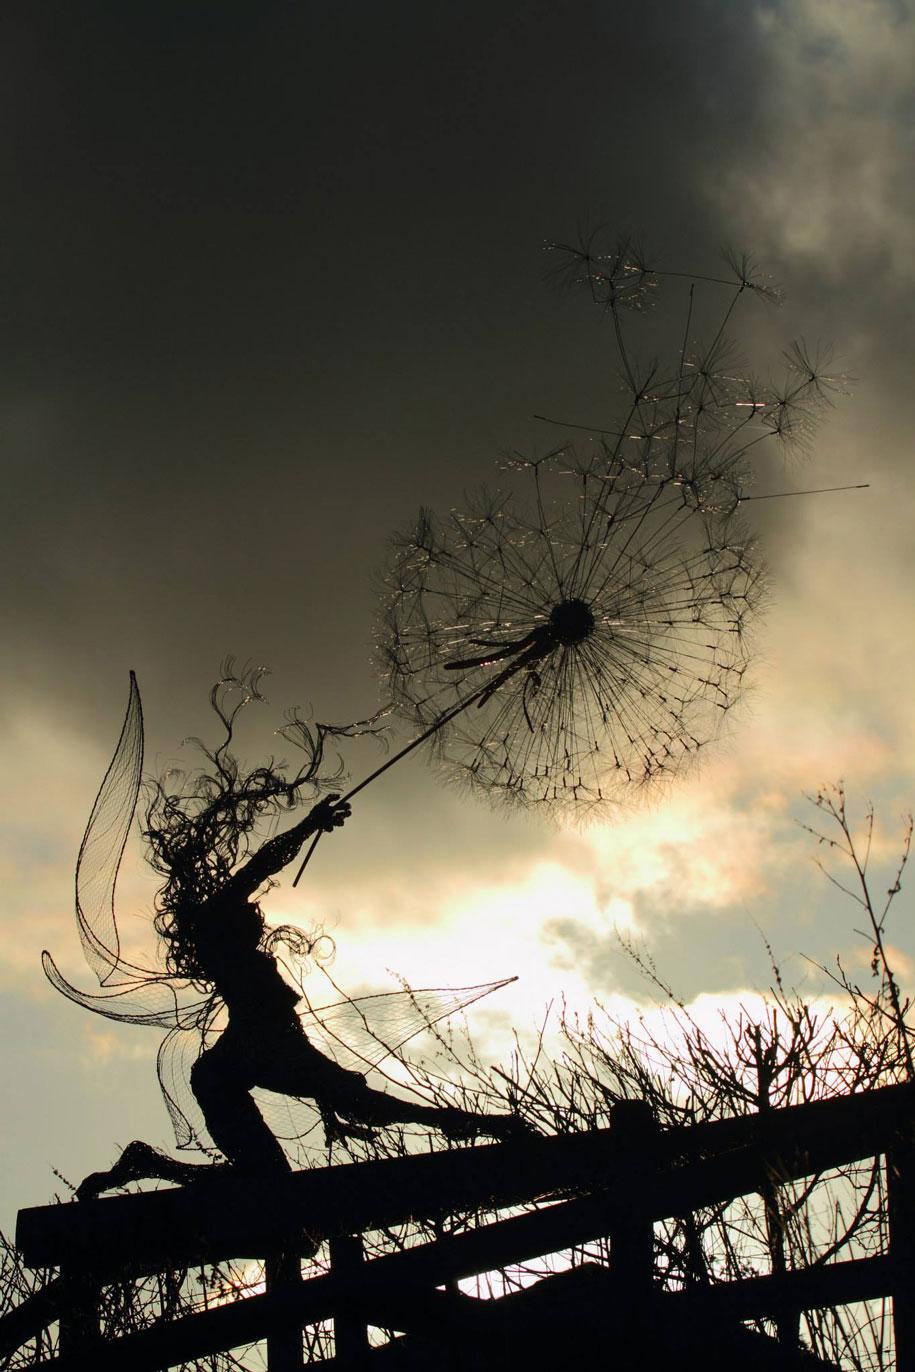 wire-fairy-dandelion-sculptures-fantasywire-robin-wight-11